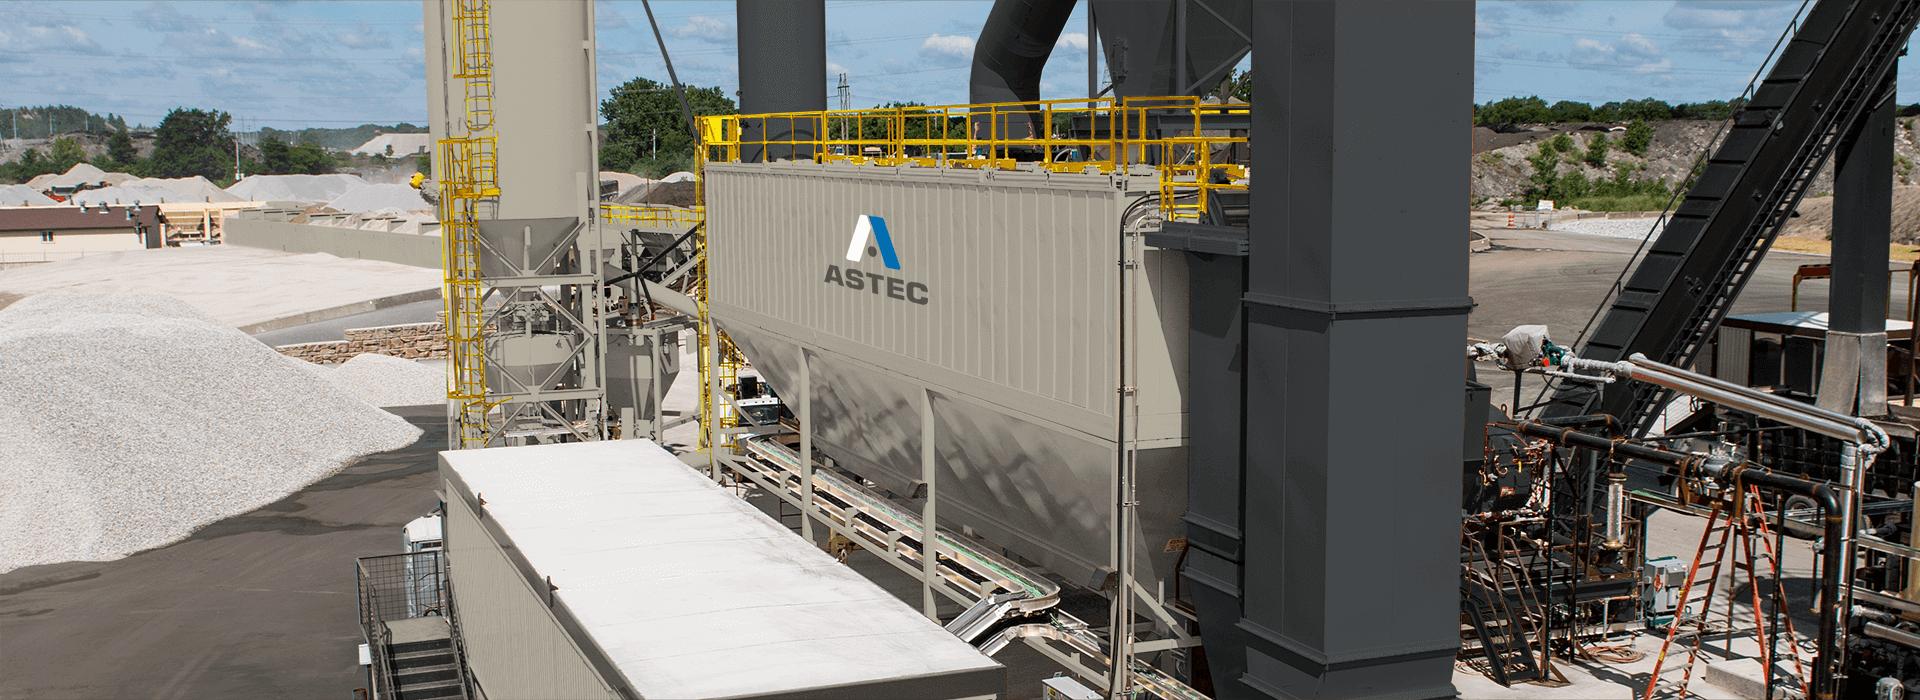 Astec reverse pulse baghouse for asphalt plants